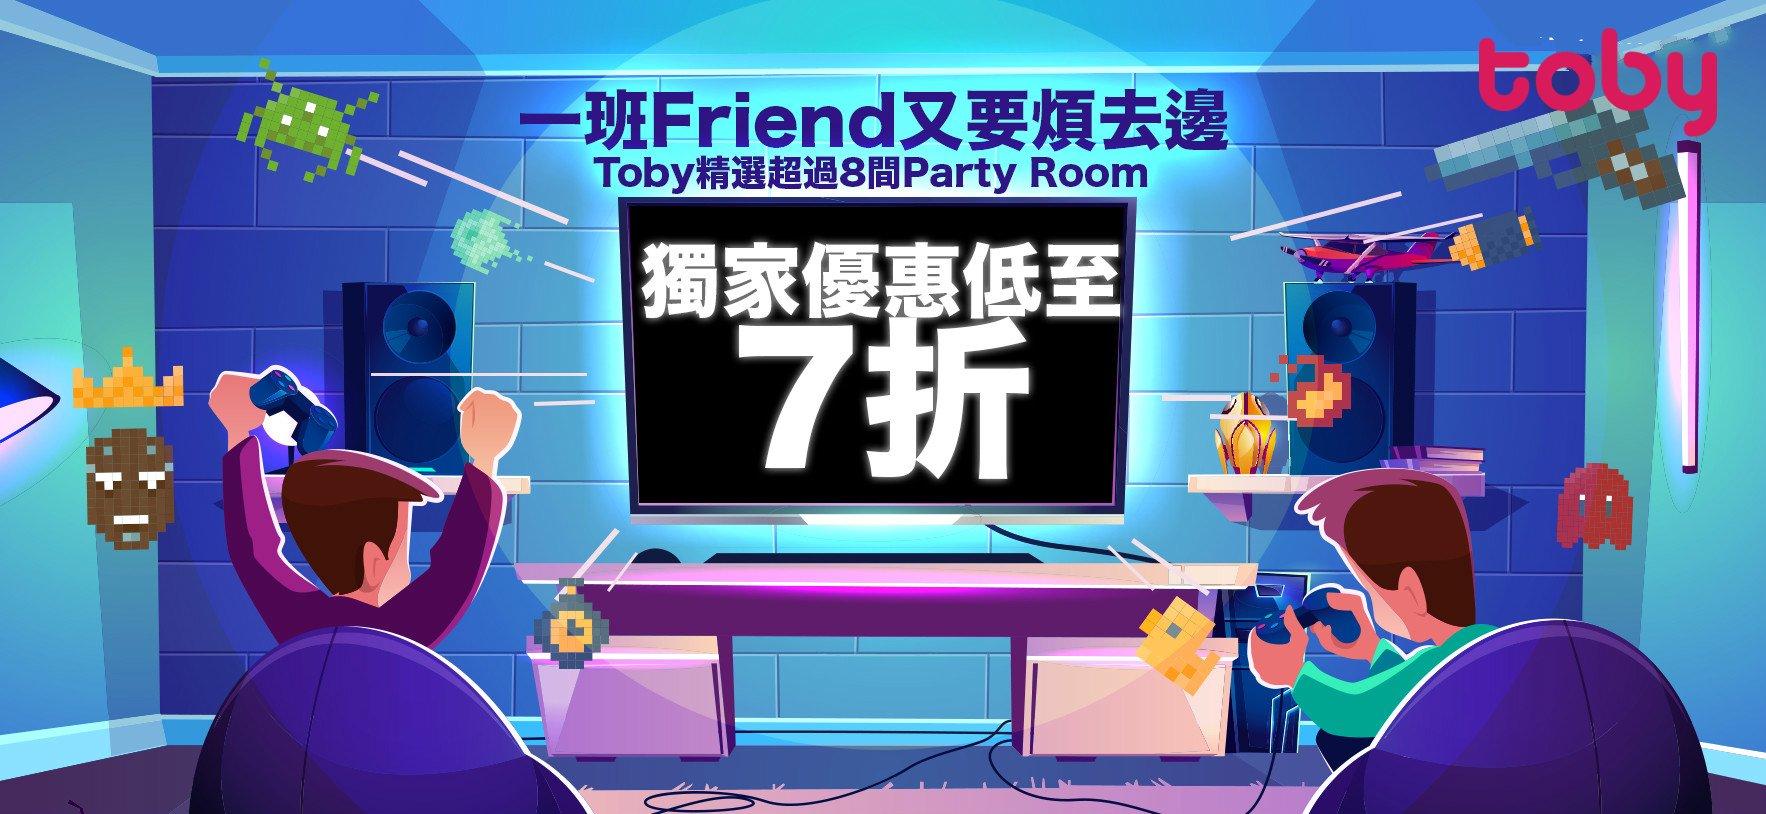 【Party搞手必備】精選8大高質Party Room